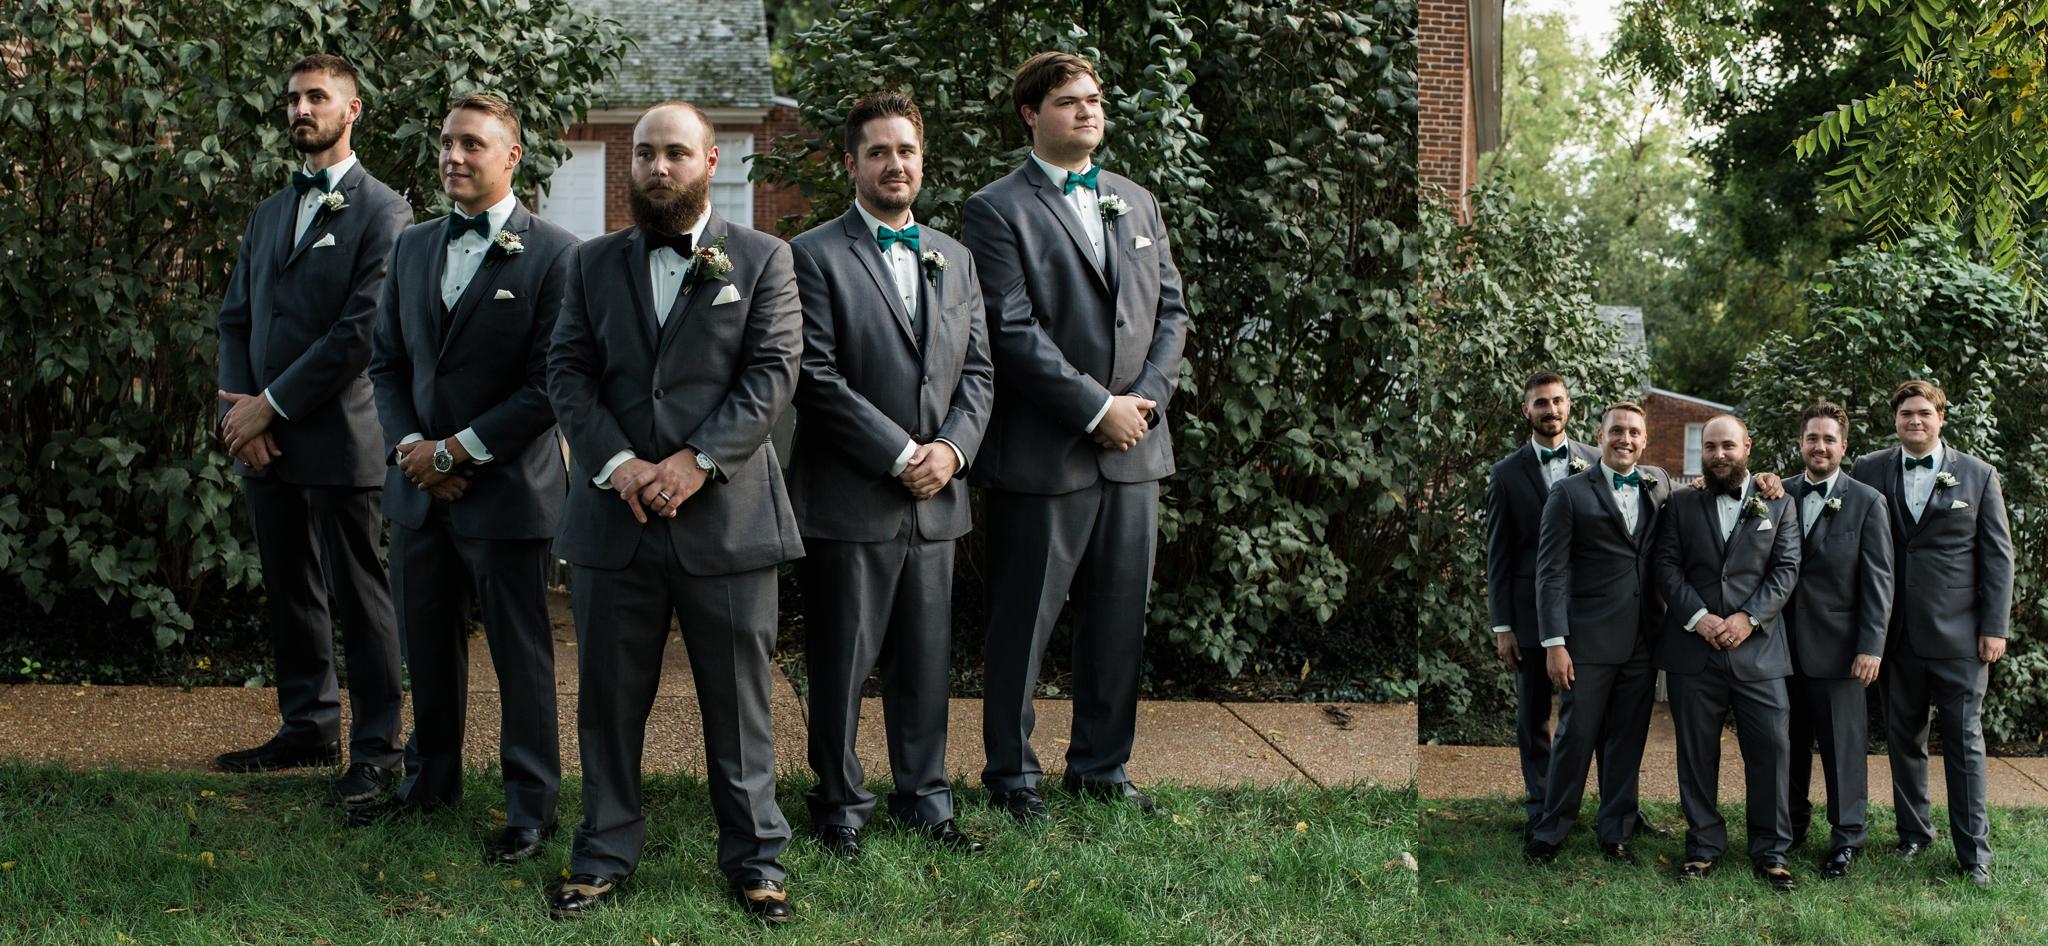 St Louis Wedding Photographer_0506.jpg